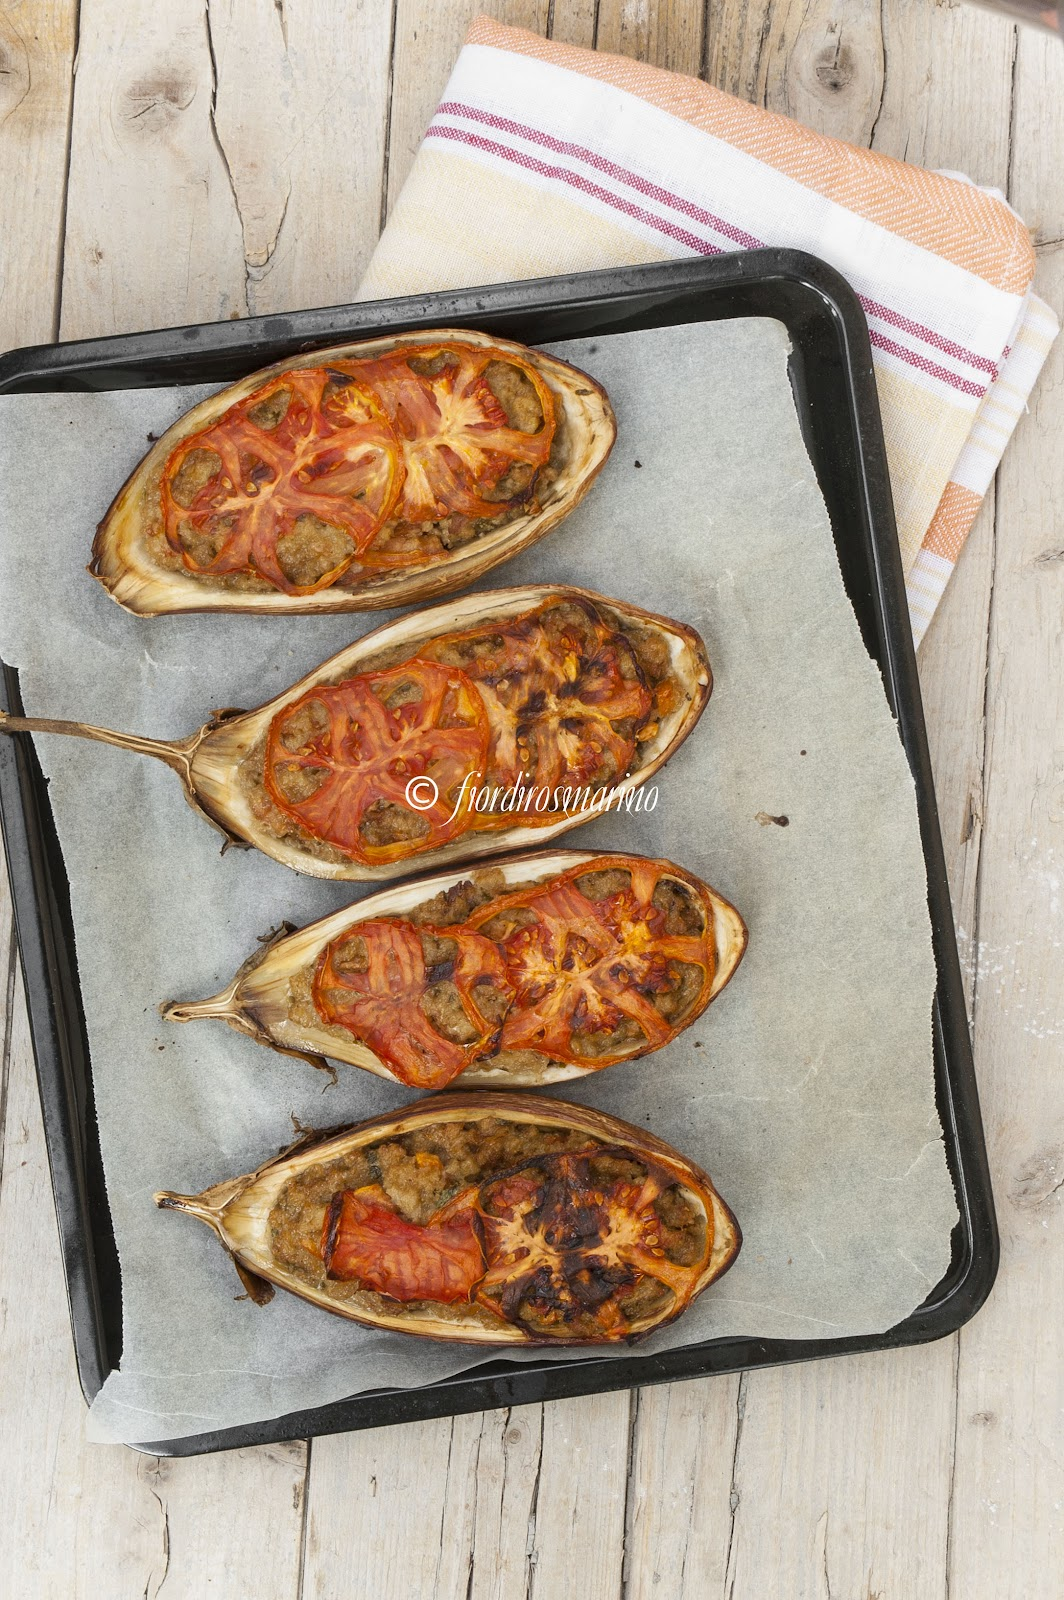 Eccezionale Melanzane striate ripiene - Cucina Italiana Blog by Fiordirosmarino QC13